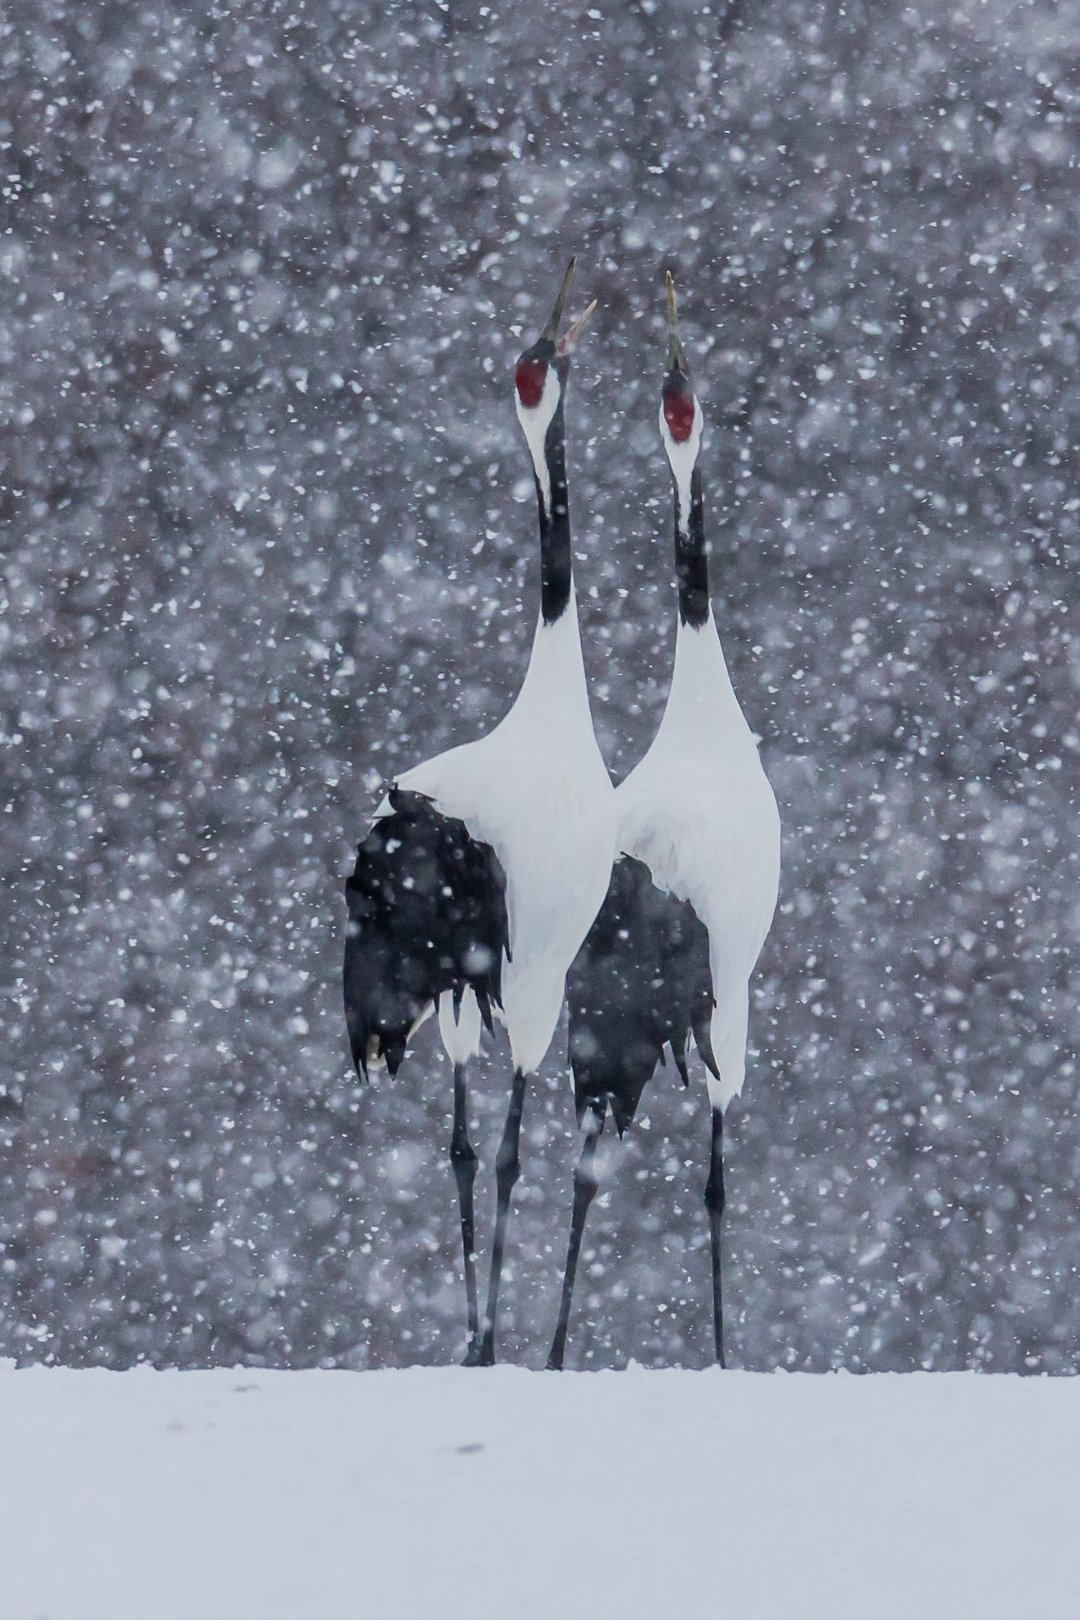 журавль, зима, пара, снег, япония, Роман Мурушкин